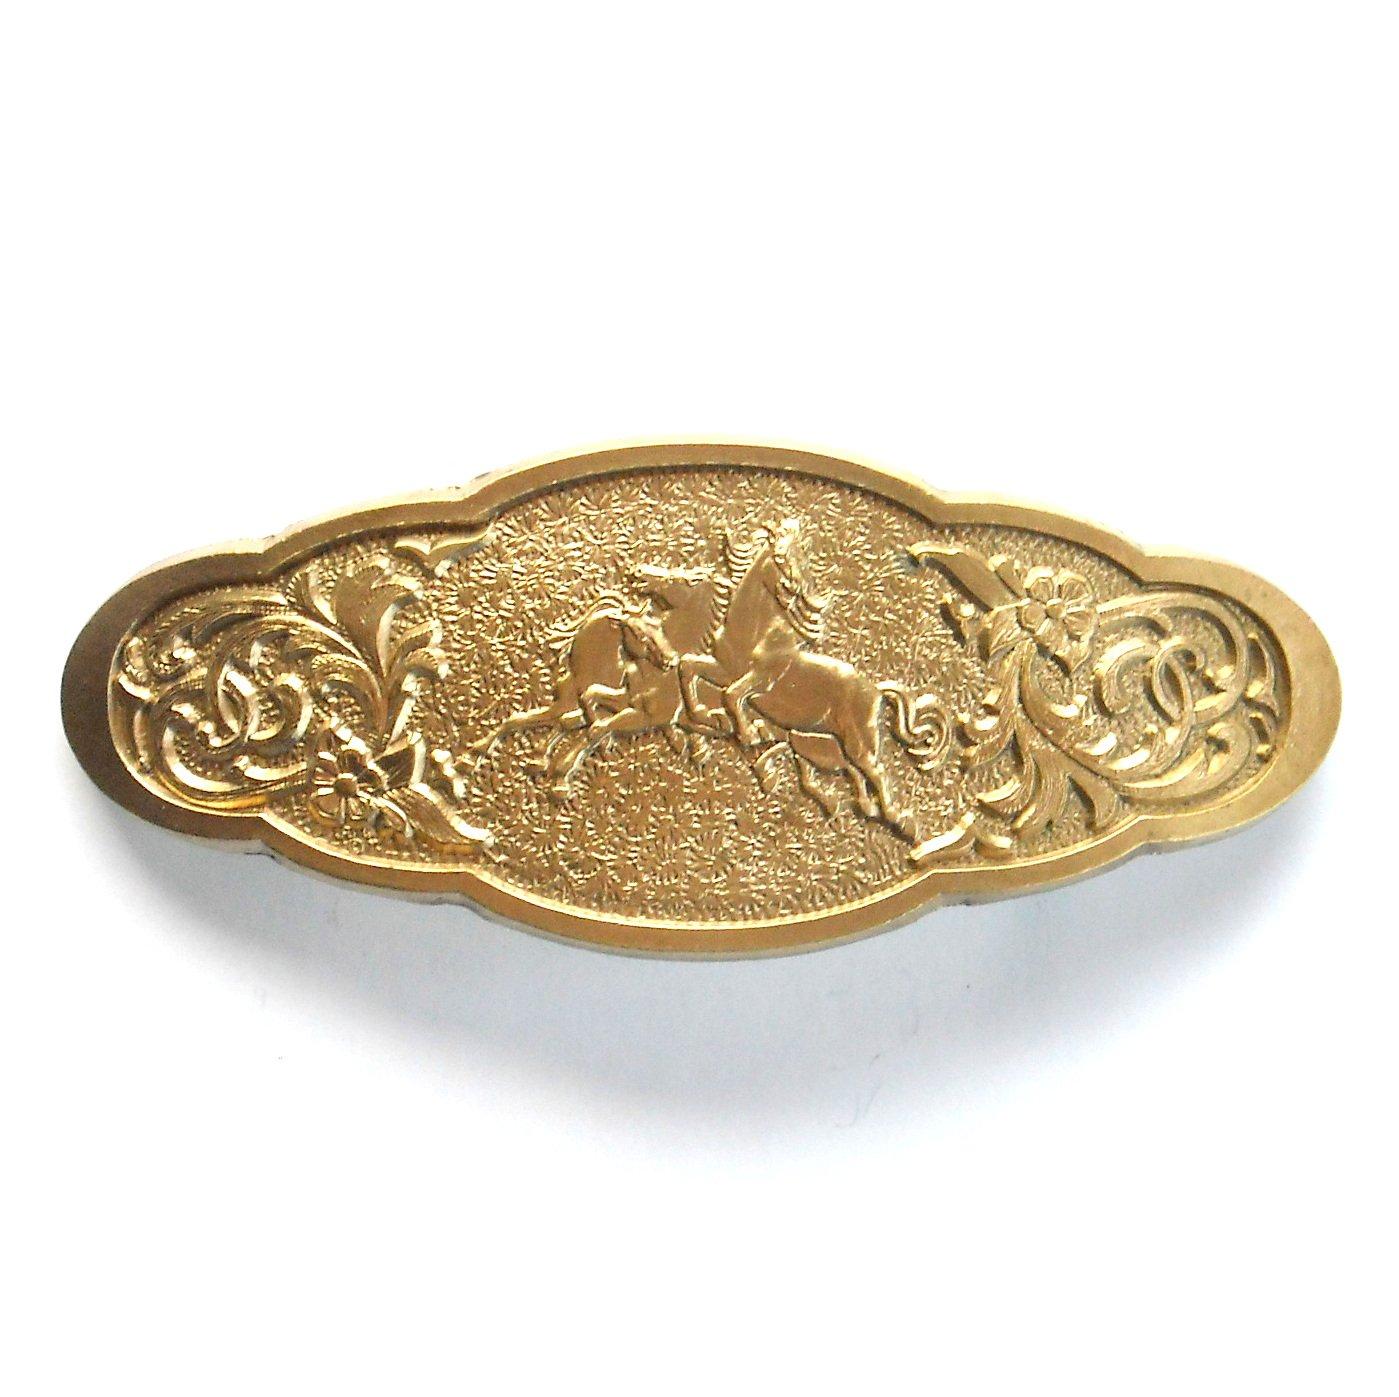 Stallions Running Horses Award Design Solid Brass Belt Buckle